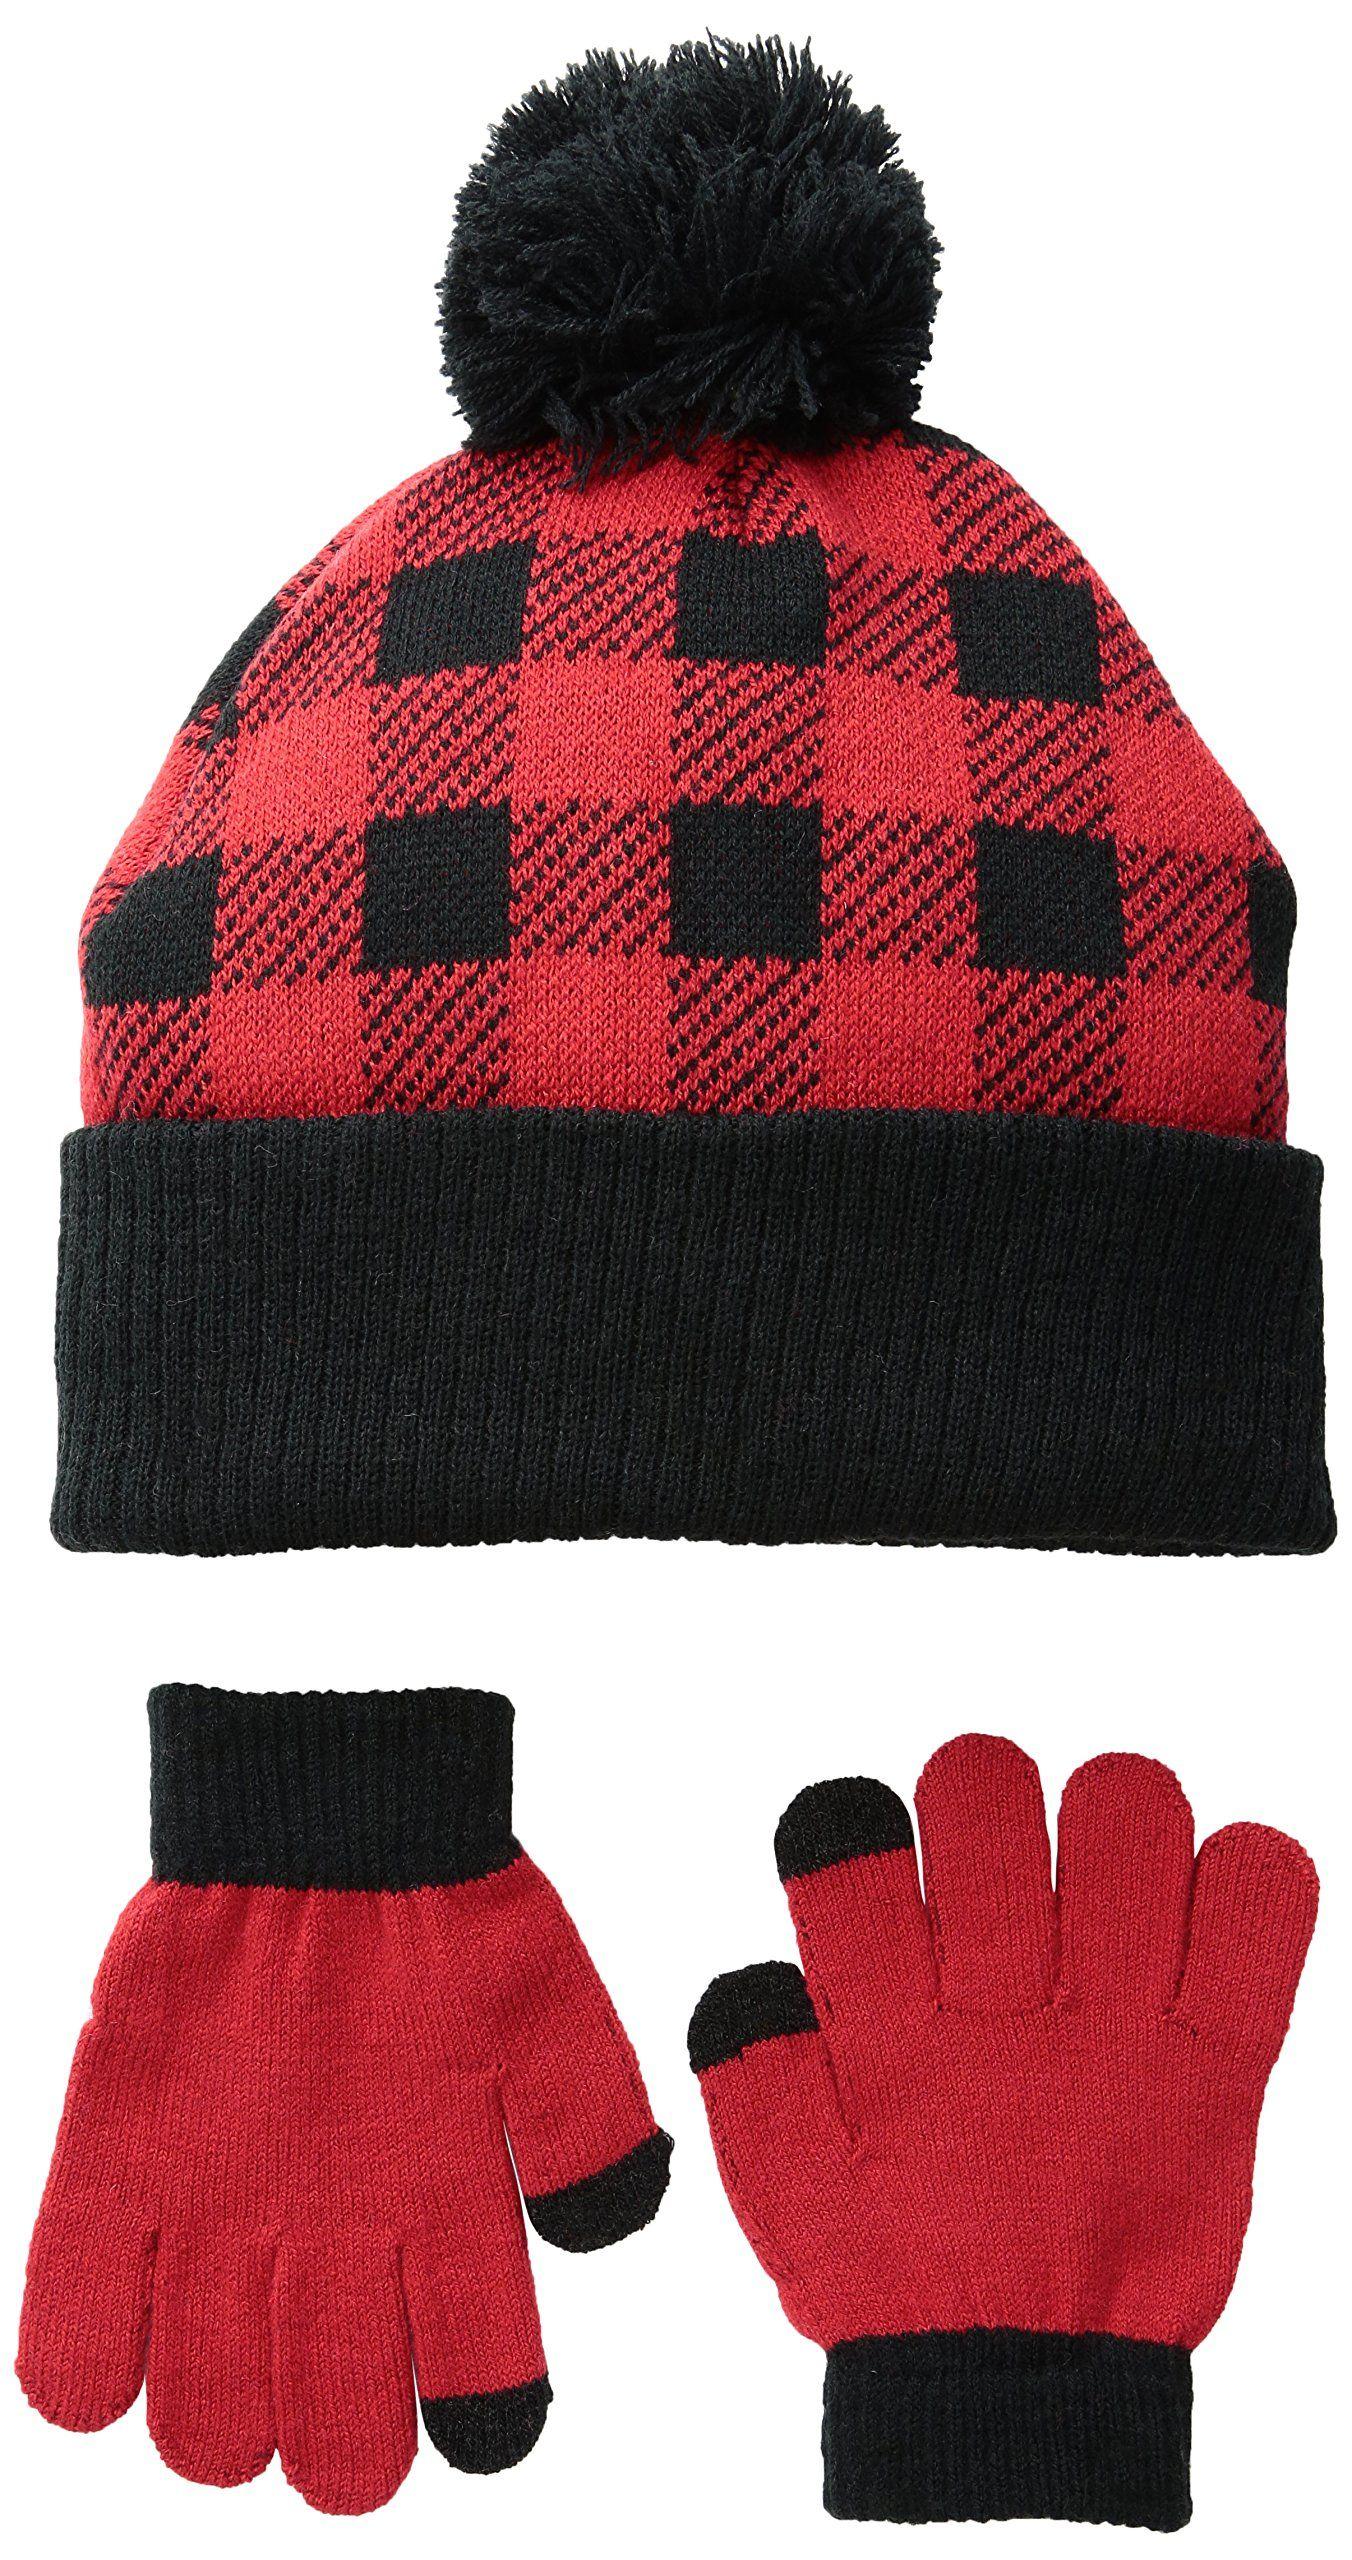 cc409856446 iXtreme Toddler Boys Buffalo Check Hat Glove 2 Pc Set